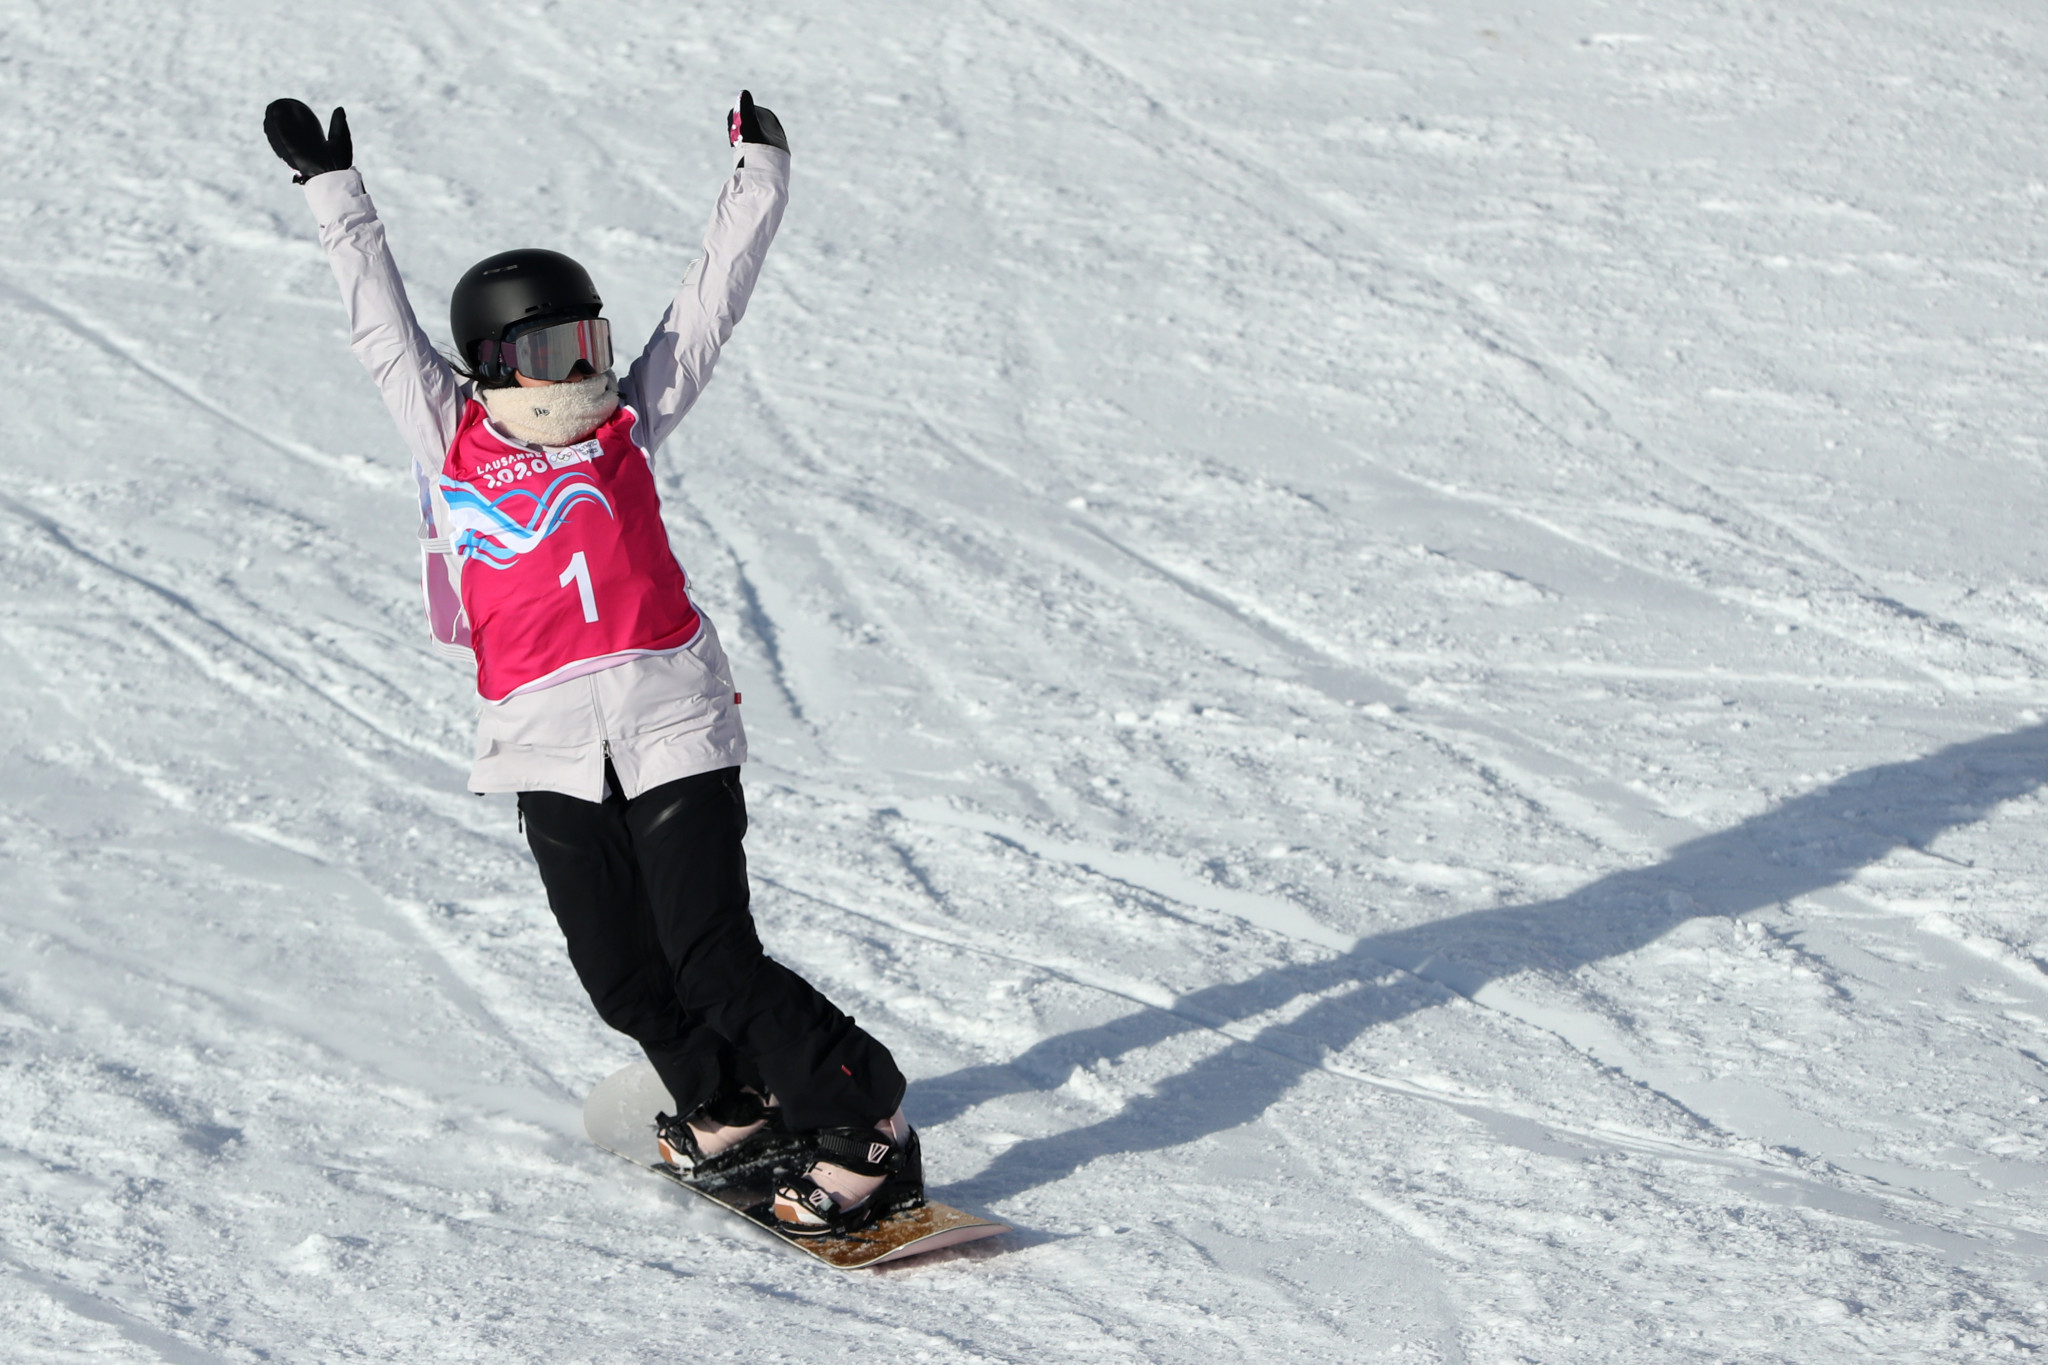 Hinari Asanuma triumphed in the women's snowboard big air event ©Getty Images